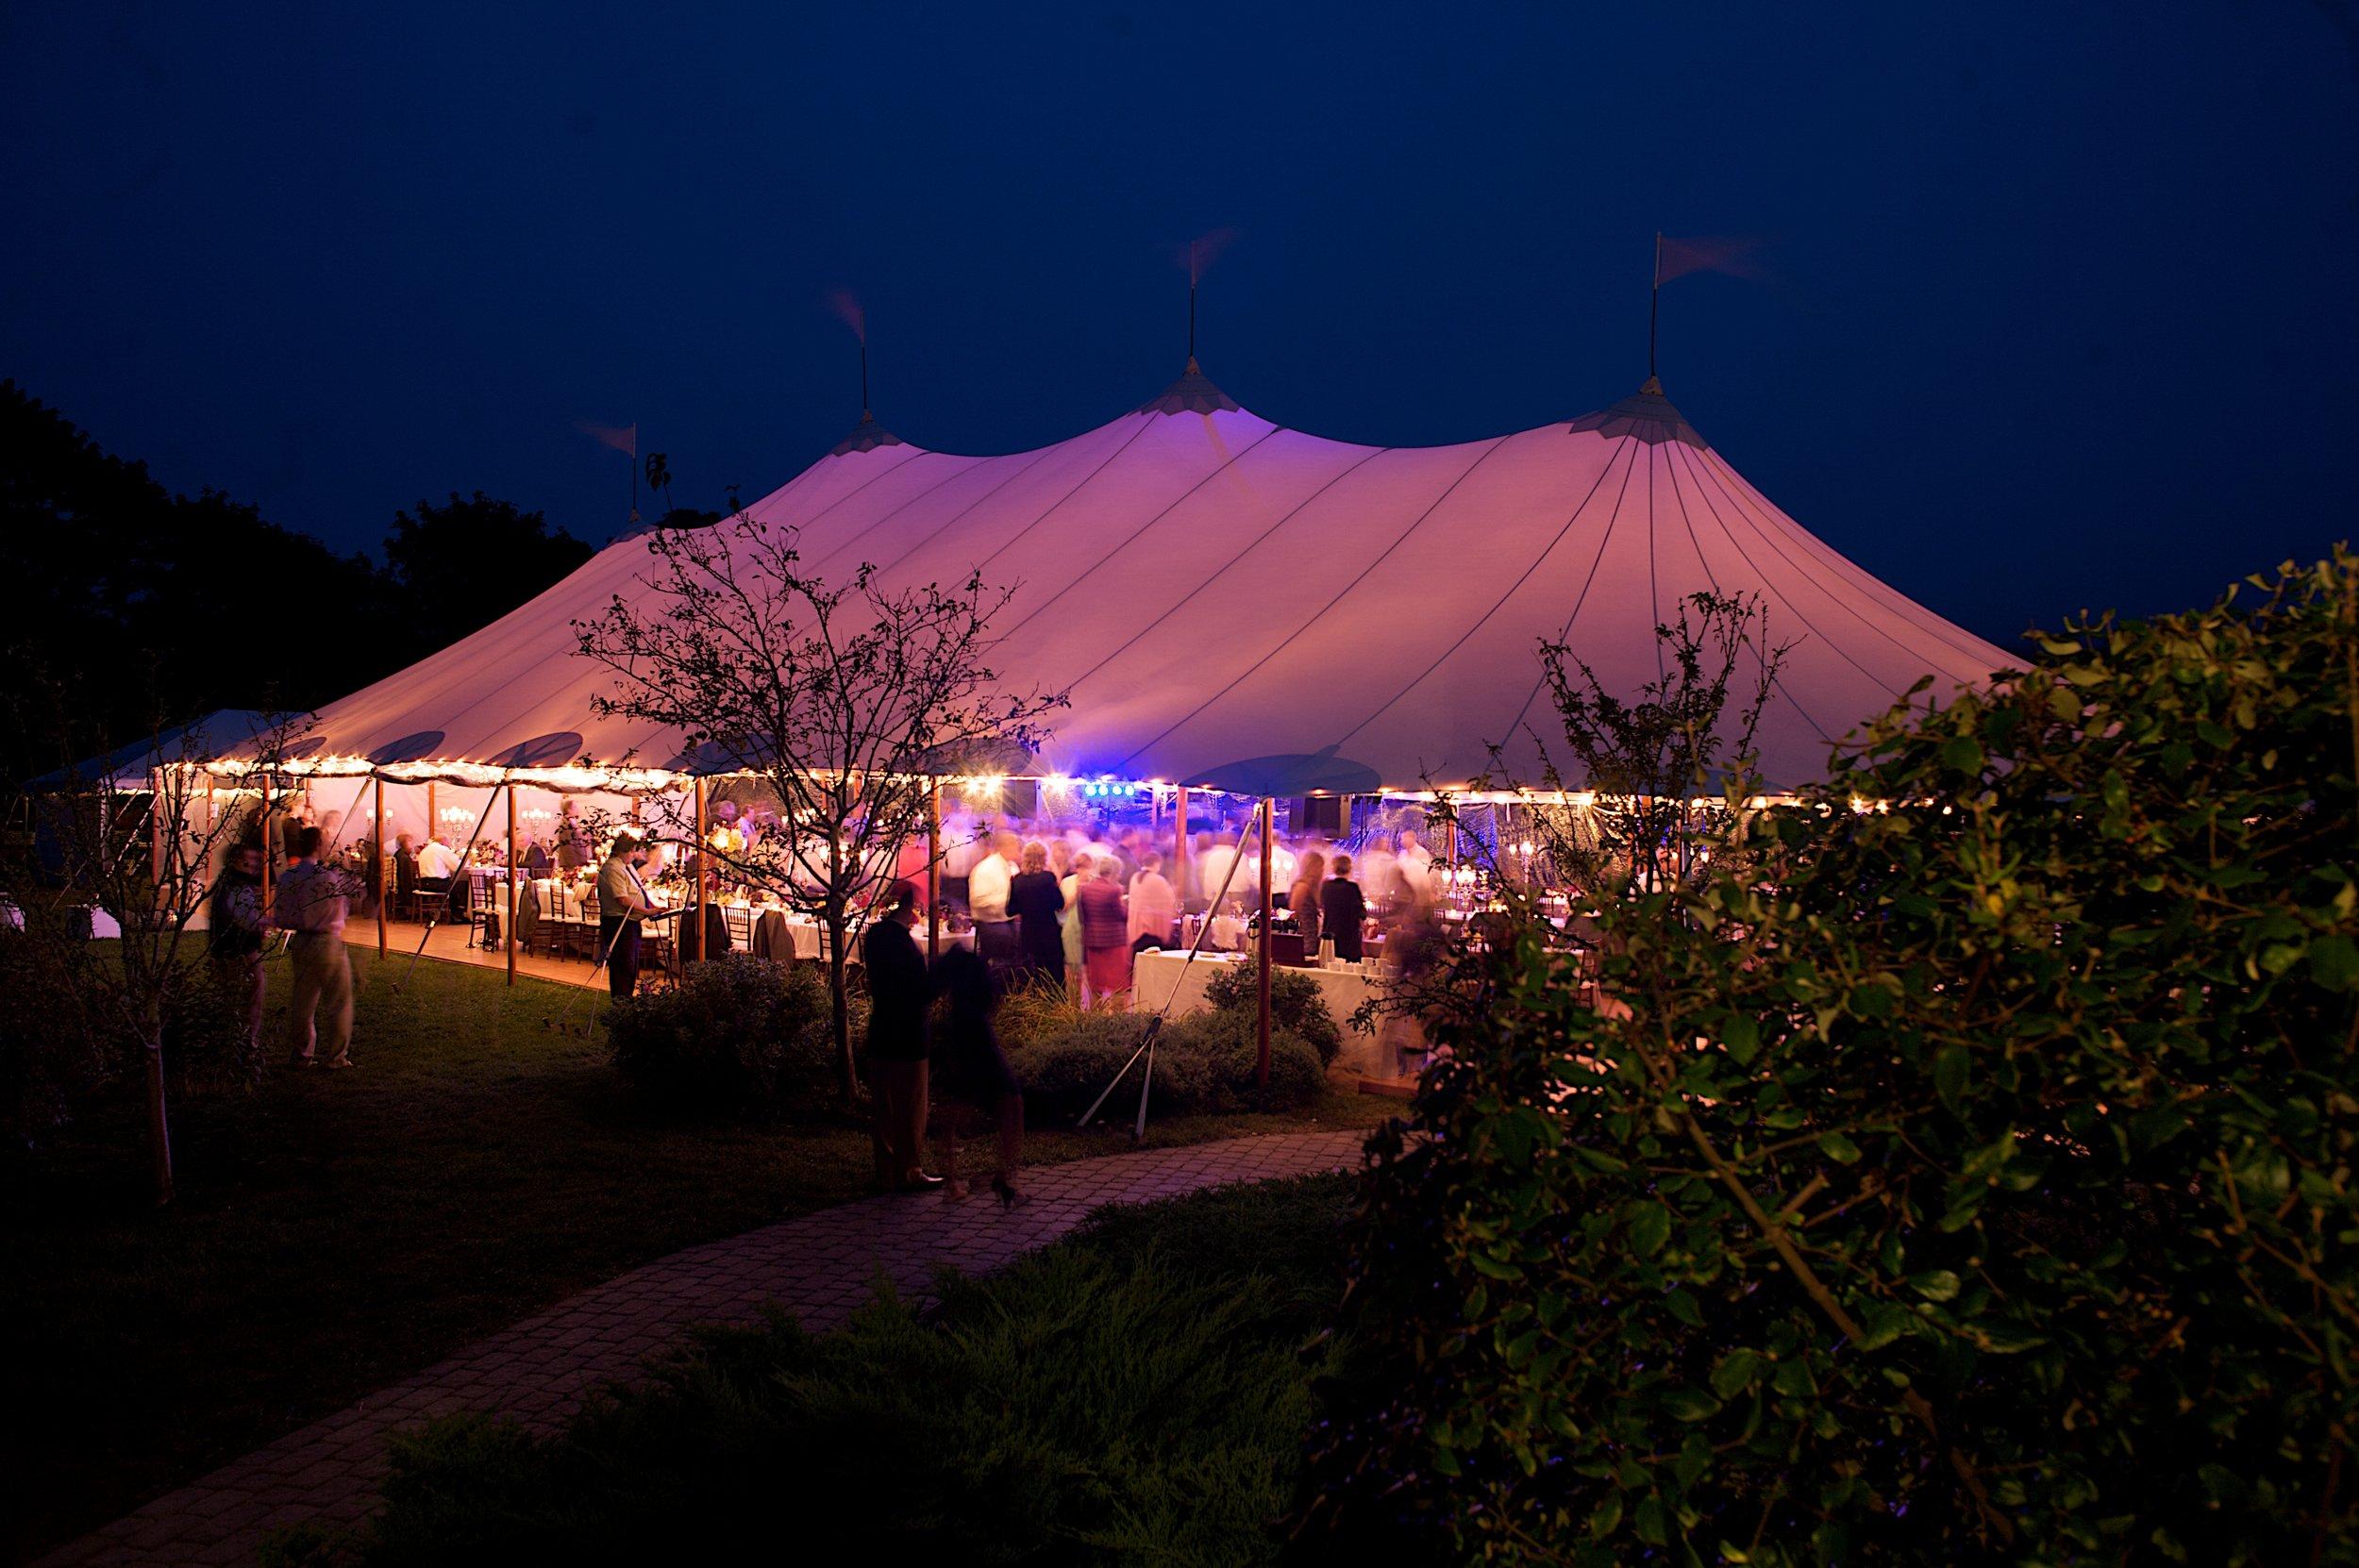 chebeague_island_inn_wedding_gabe_aceves035.JPG